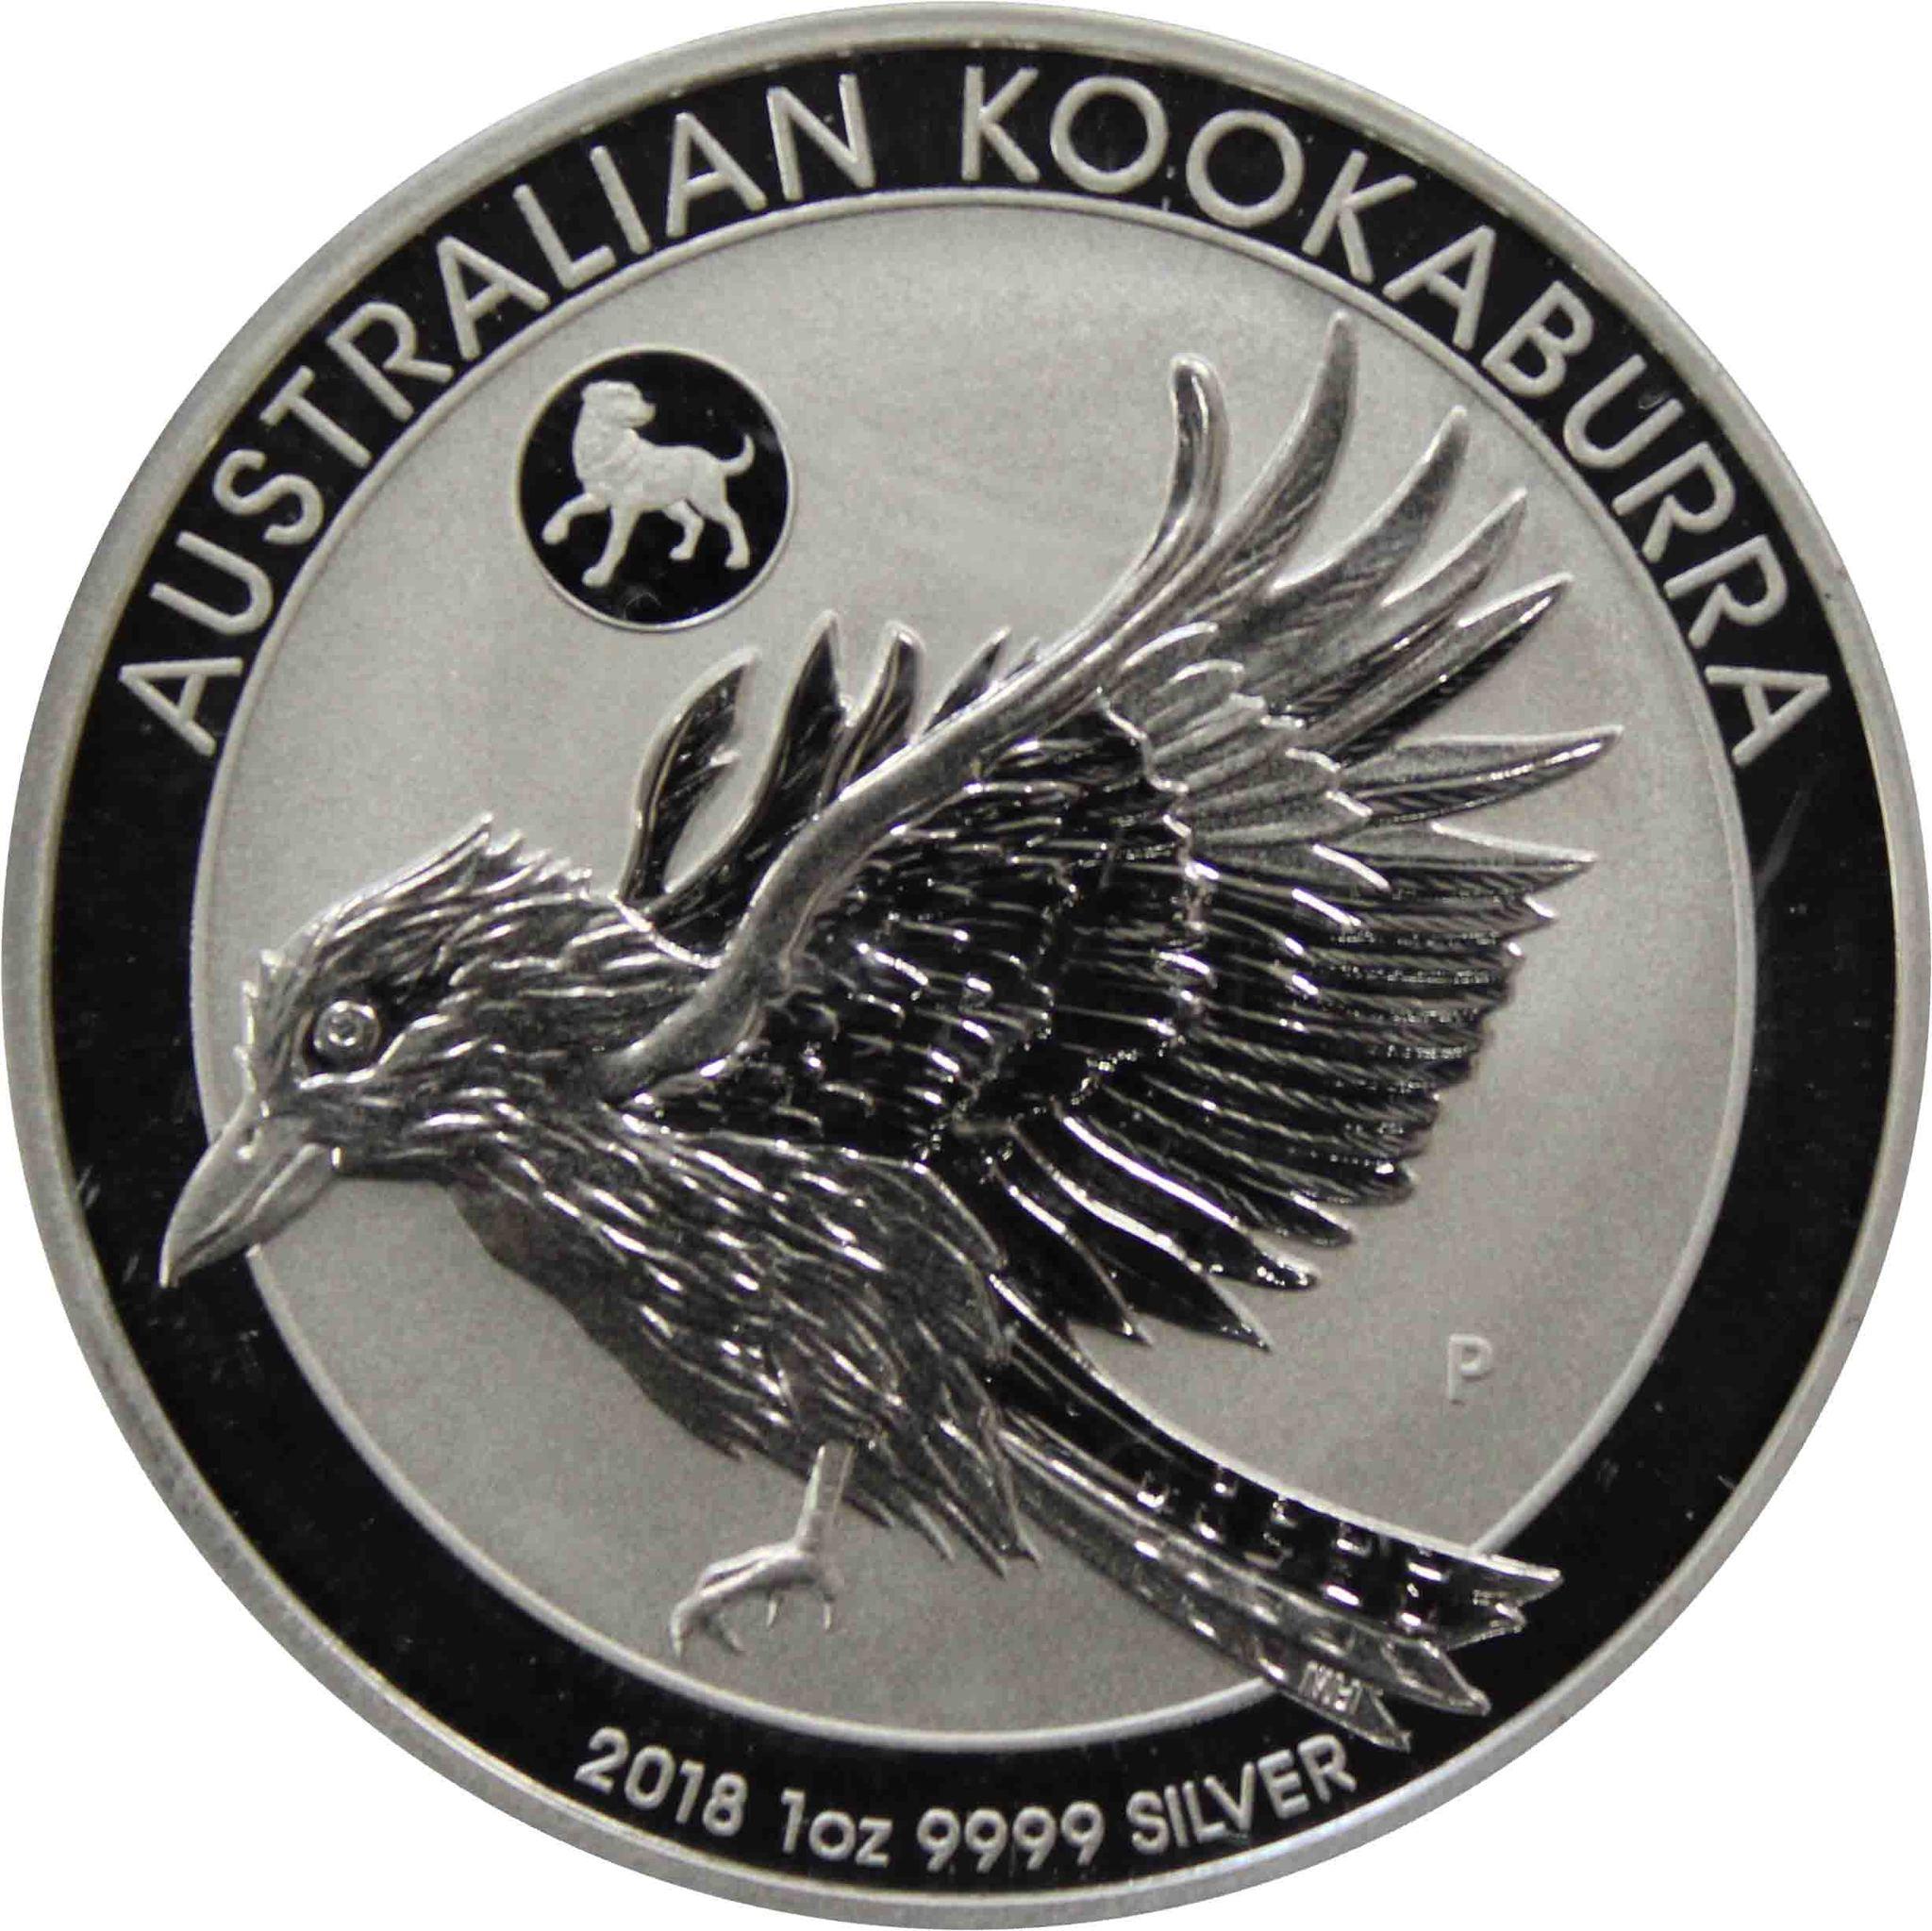 "1 доллар. Кукабарра прайви марк Собака"" Австралия. 2018 год"